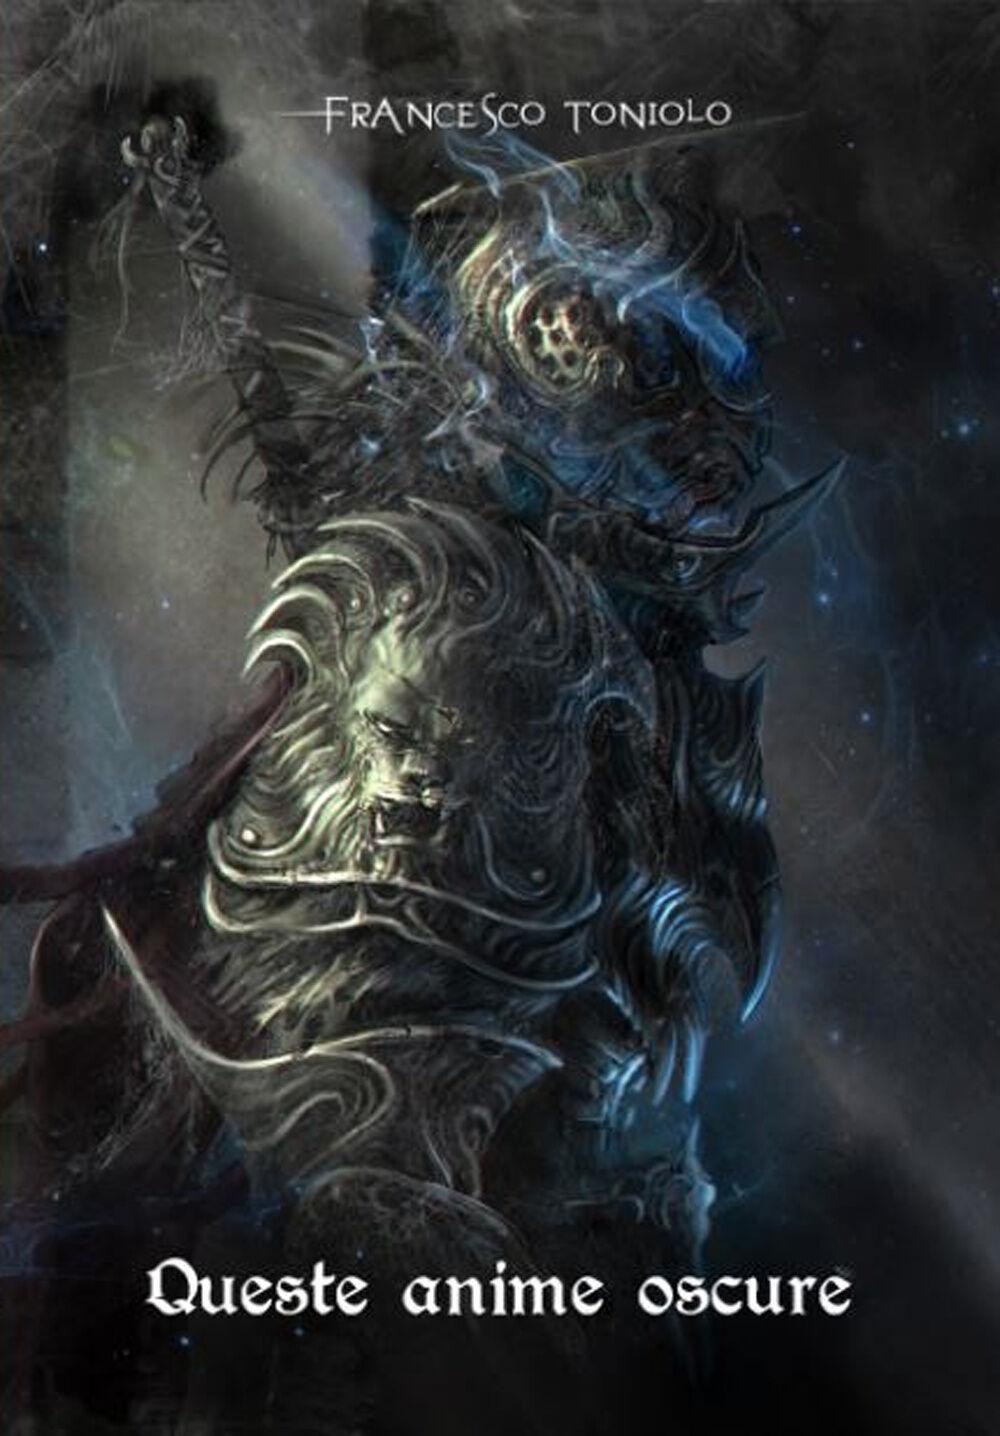 queste oscure anime da demon s souls a bloodborne incursioni libro queste oscure anime da demon s souls a bloodborne incursioni escursioni suggestioni